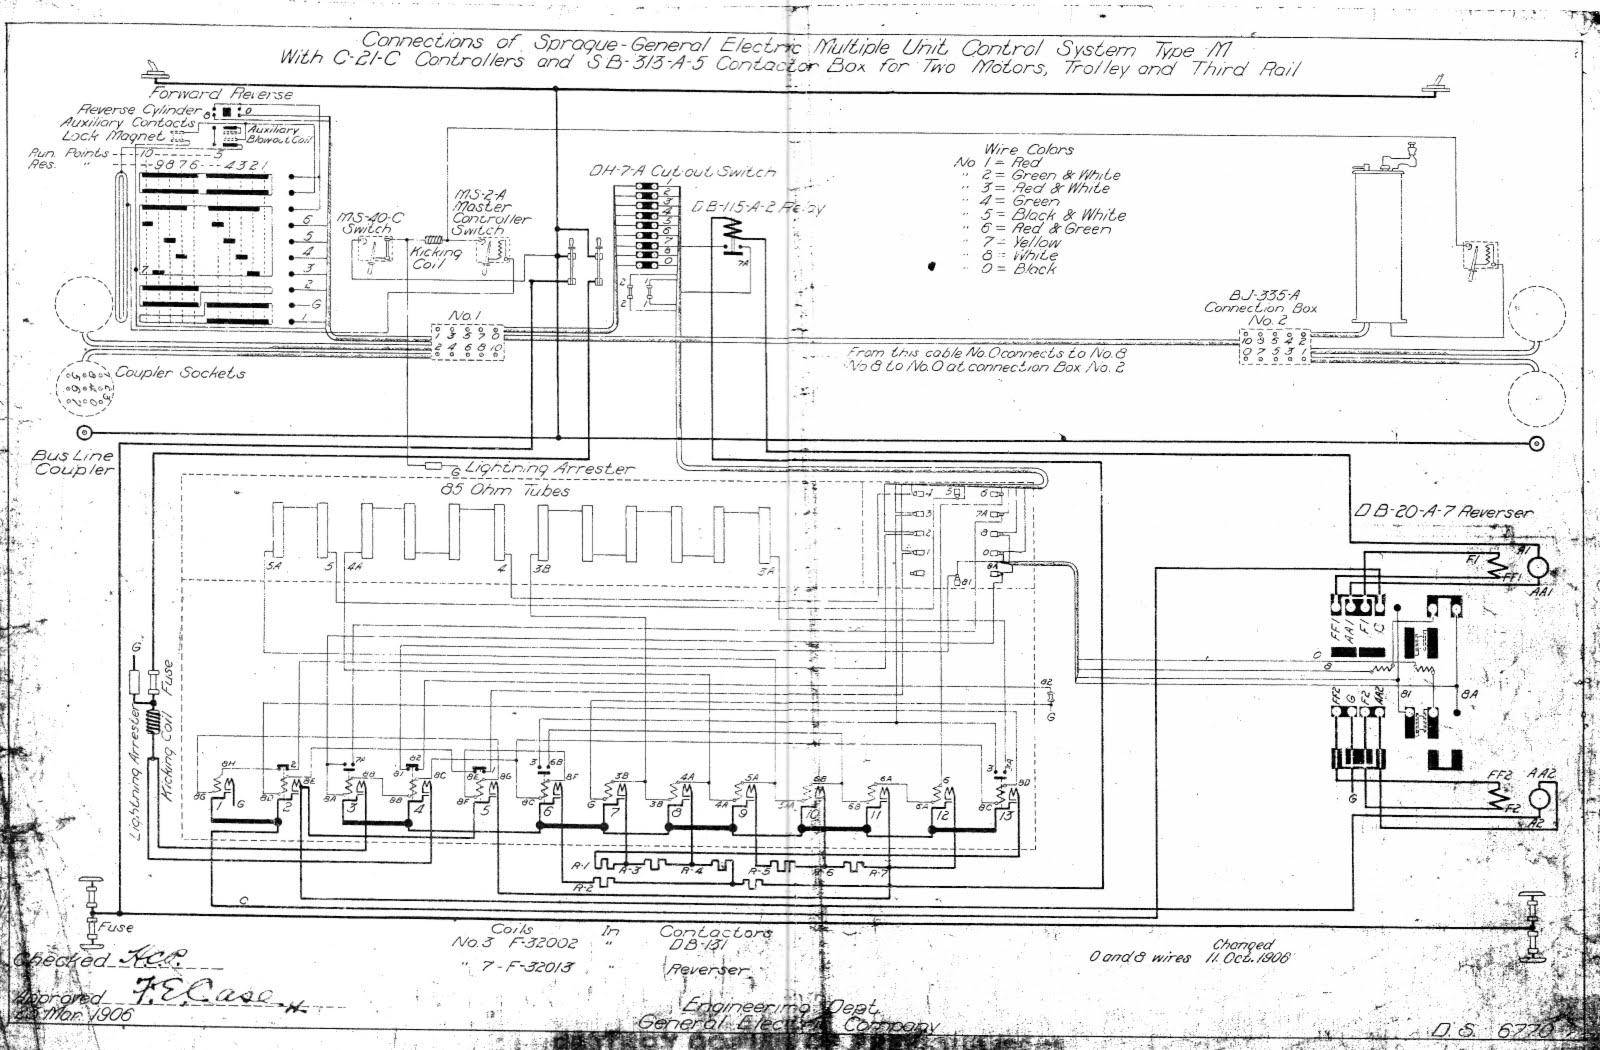 97 geo tracker wiring diagram base [ 1600 x 1050 Pixel ]